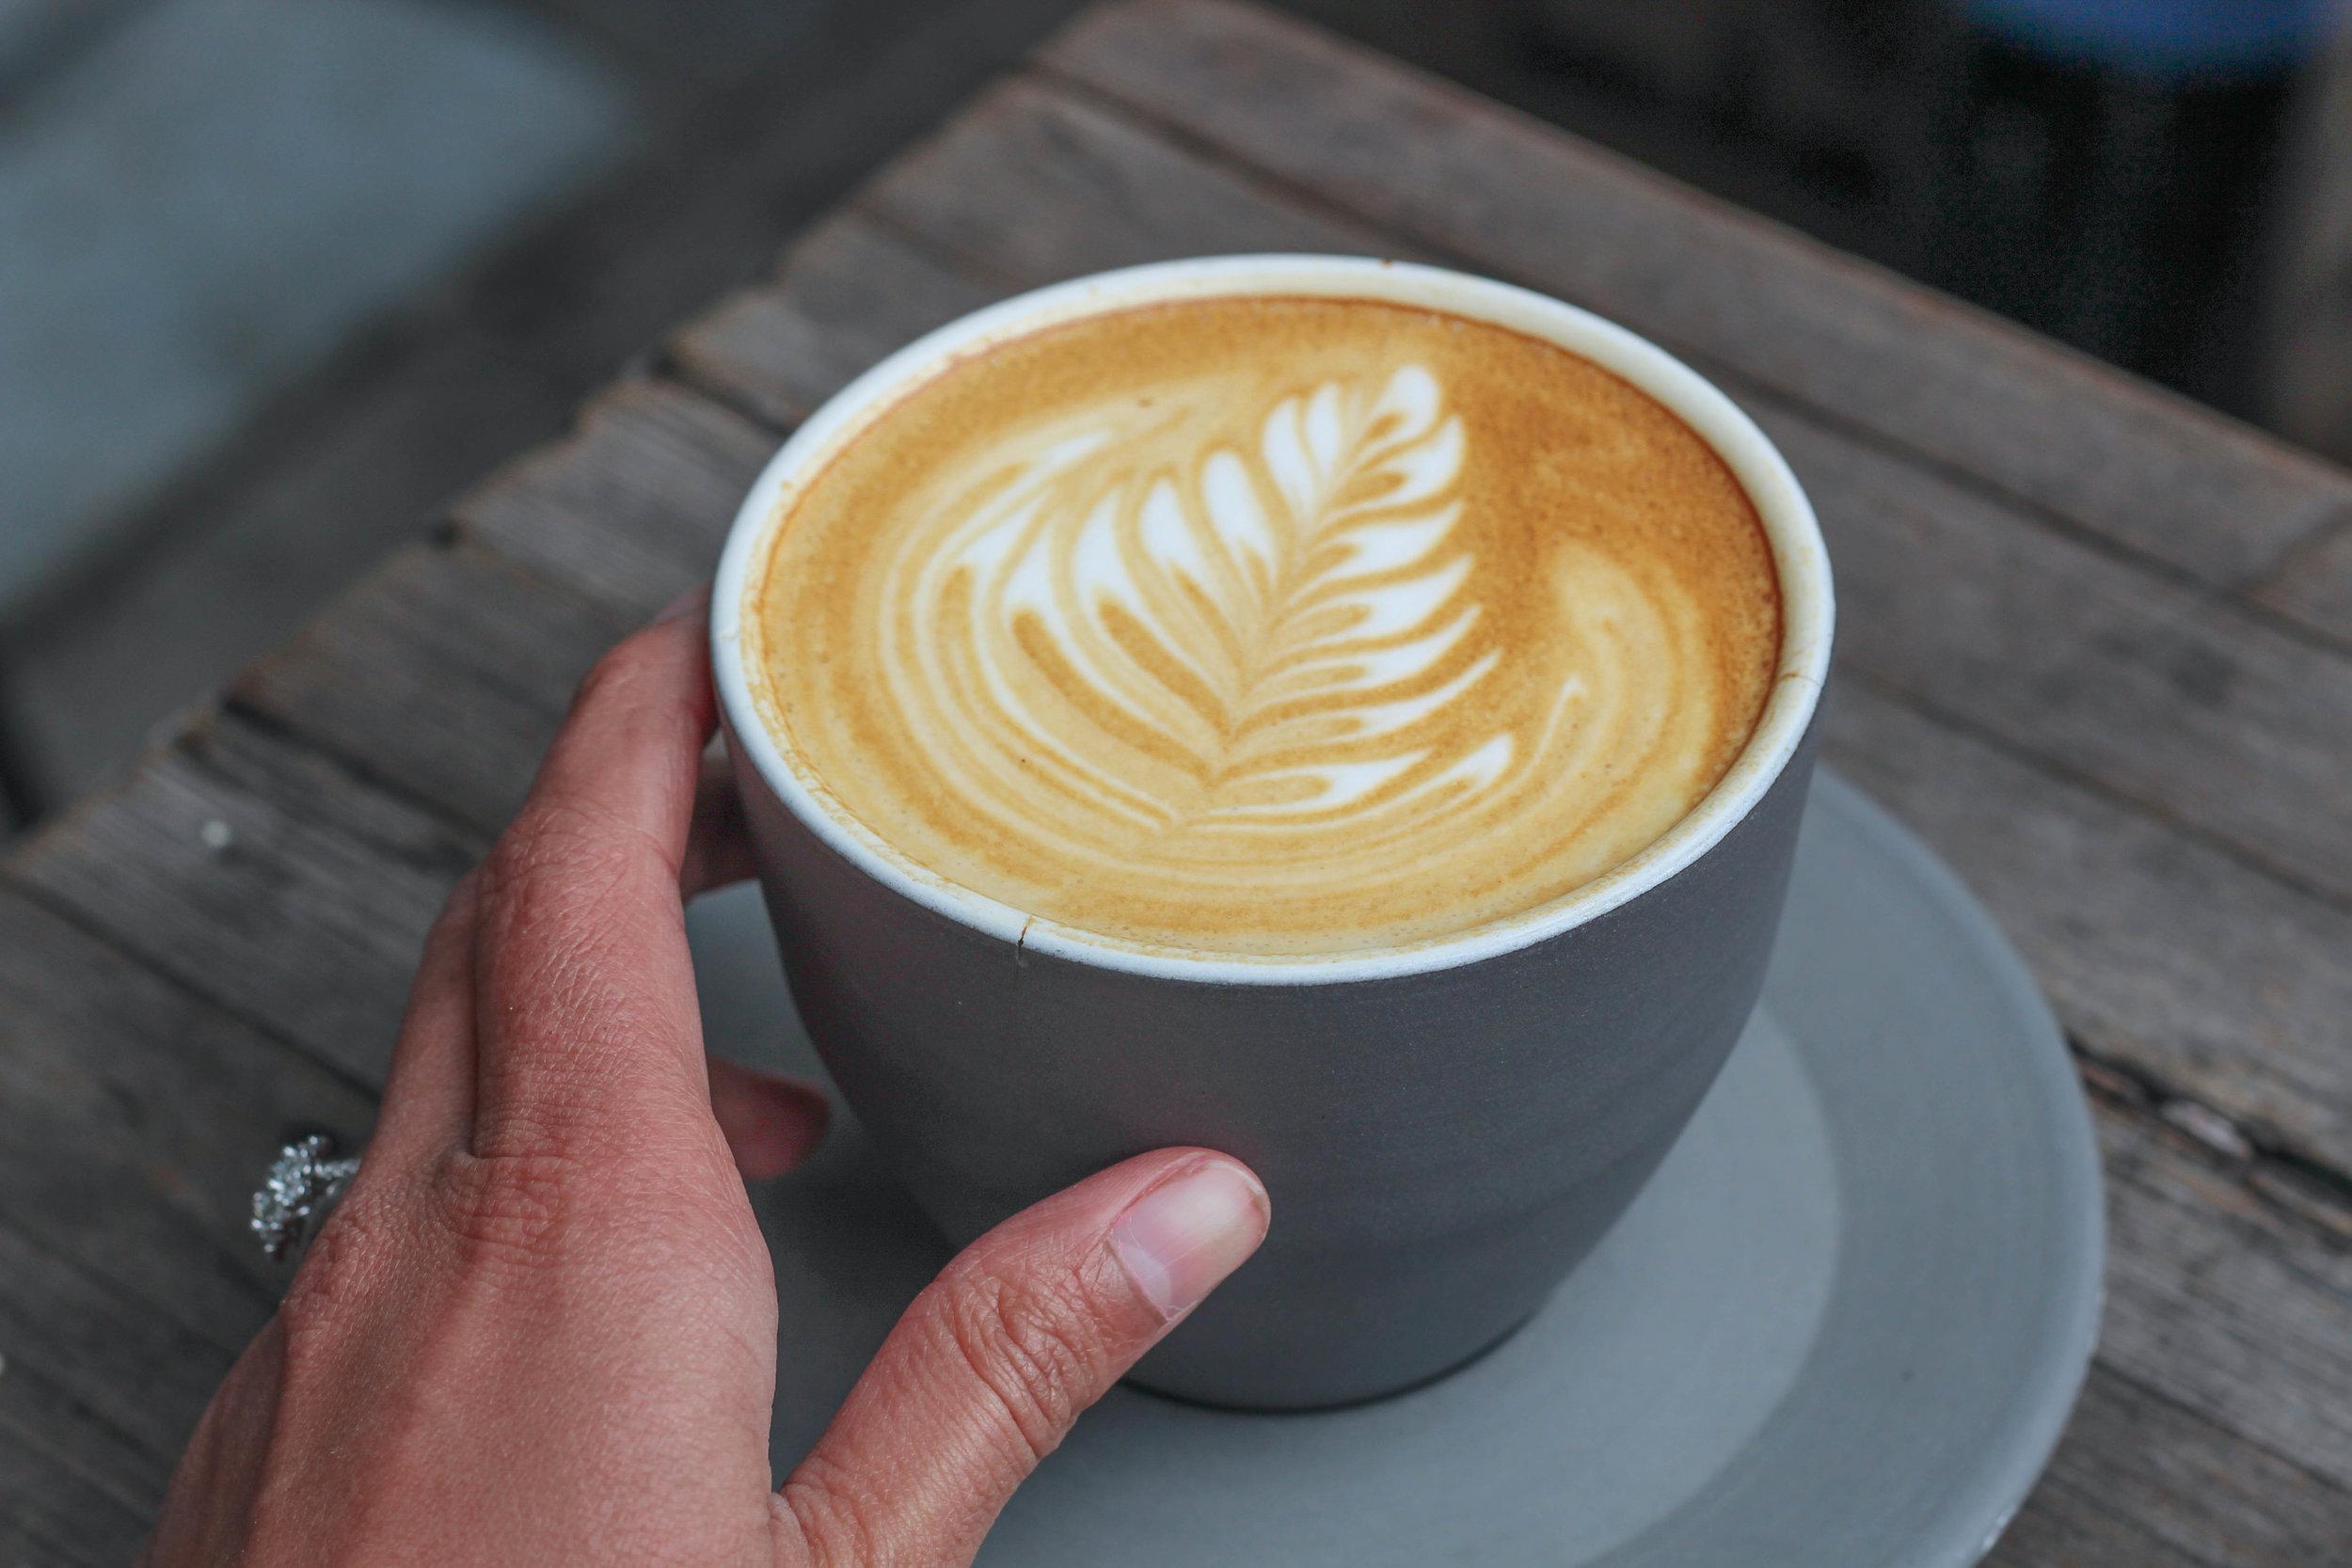 Best Coffee Shops in San Francisco: Four Barrel